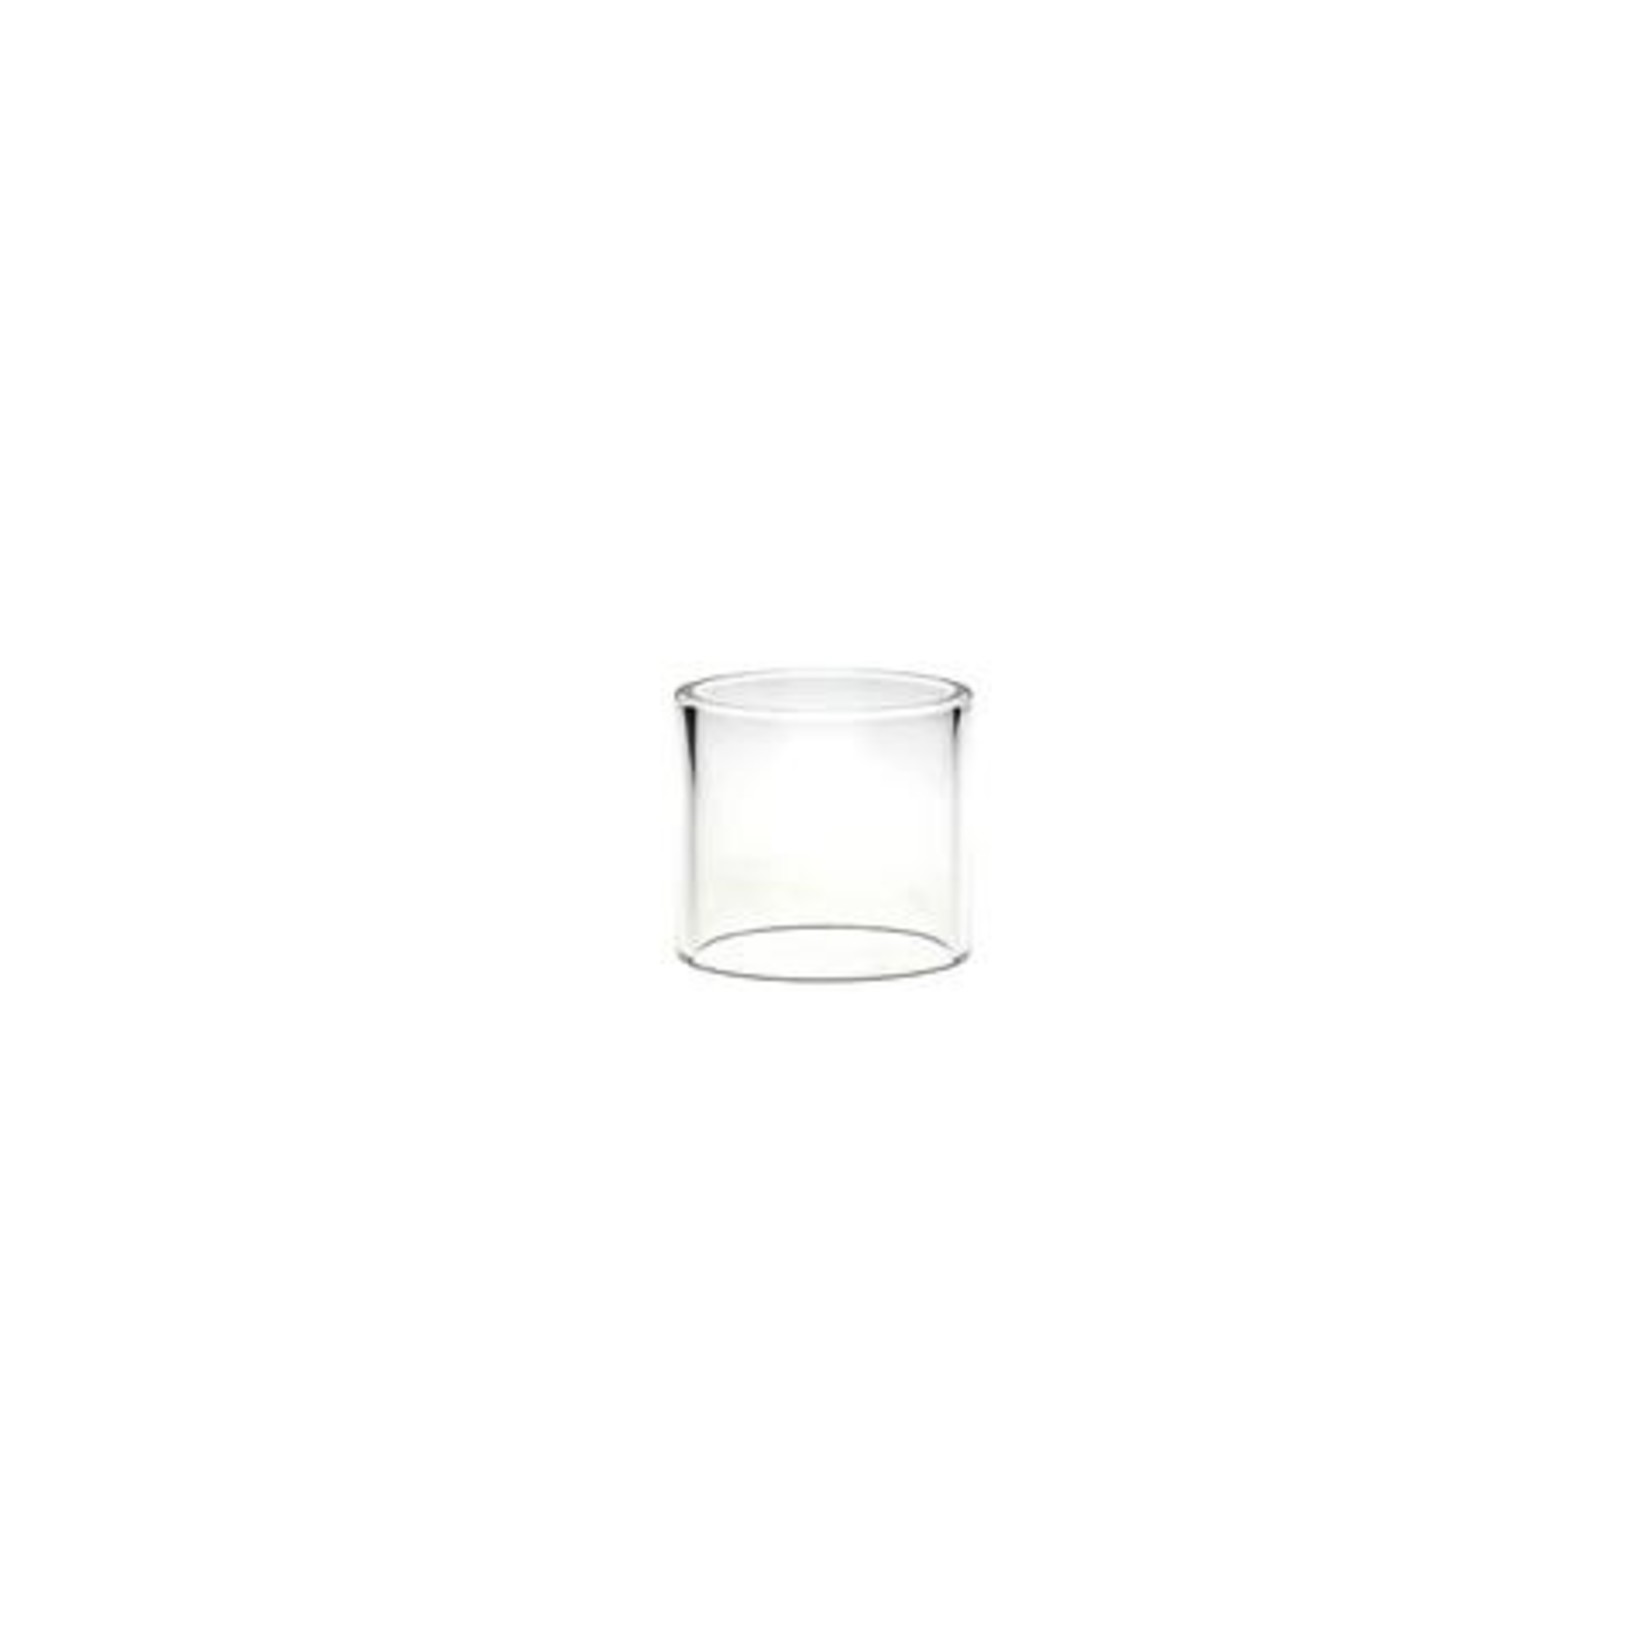 Freemax Fireluke/Fireluke 2 Replacement Glass